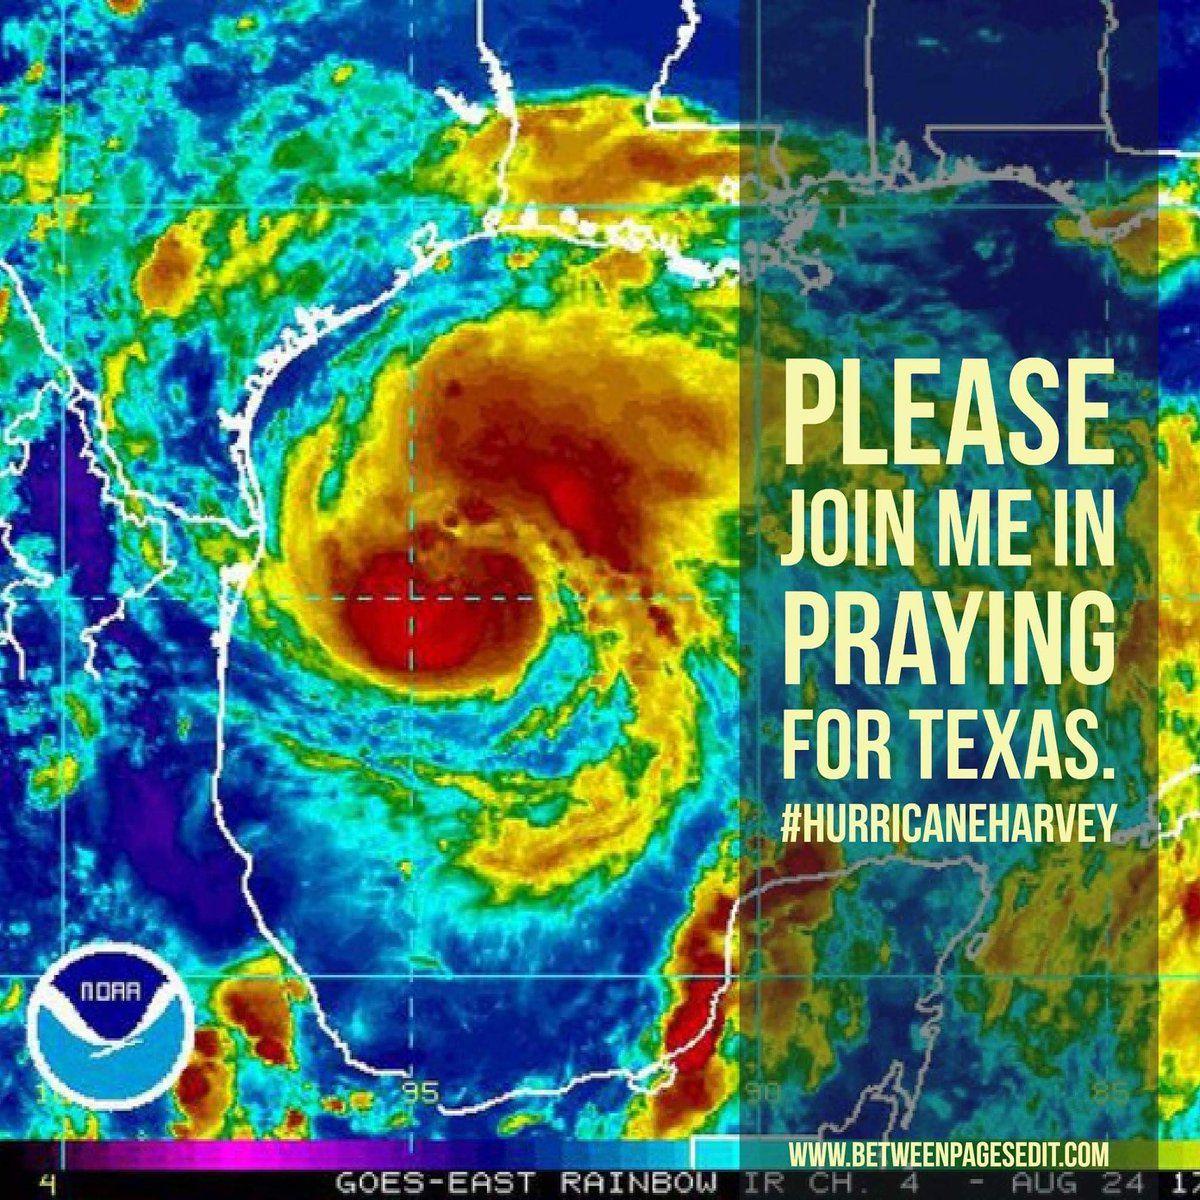 News About Hurricaneharvey On Twitter Harvey Rainbow Hurricane